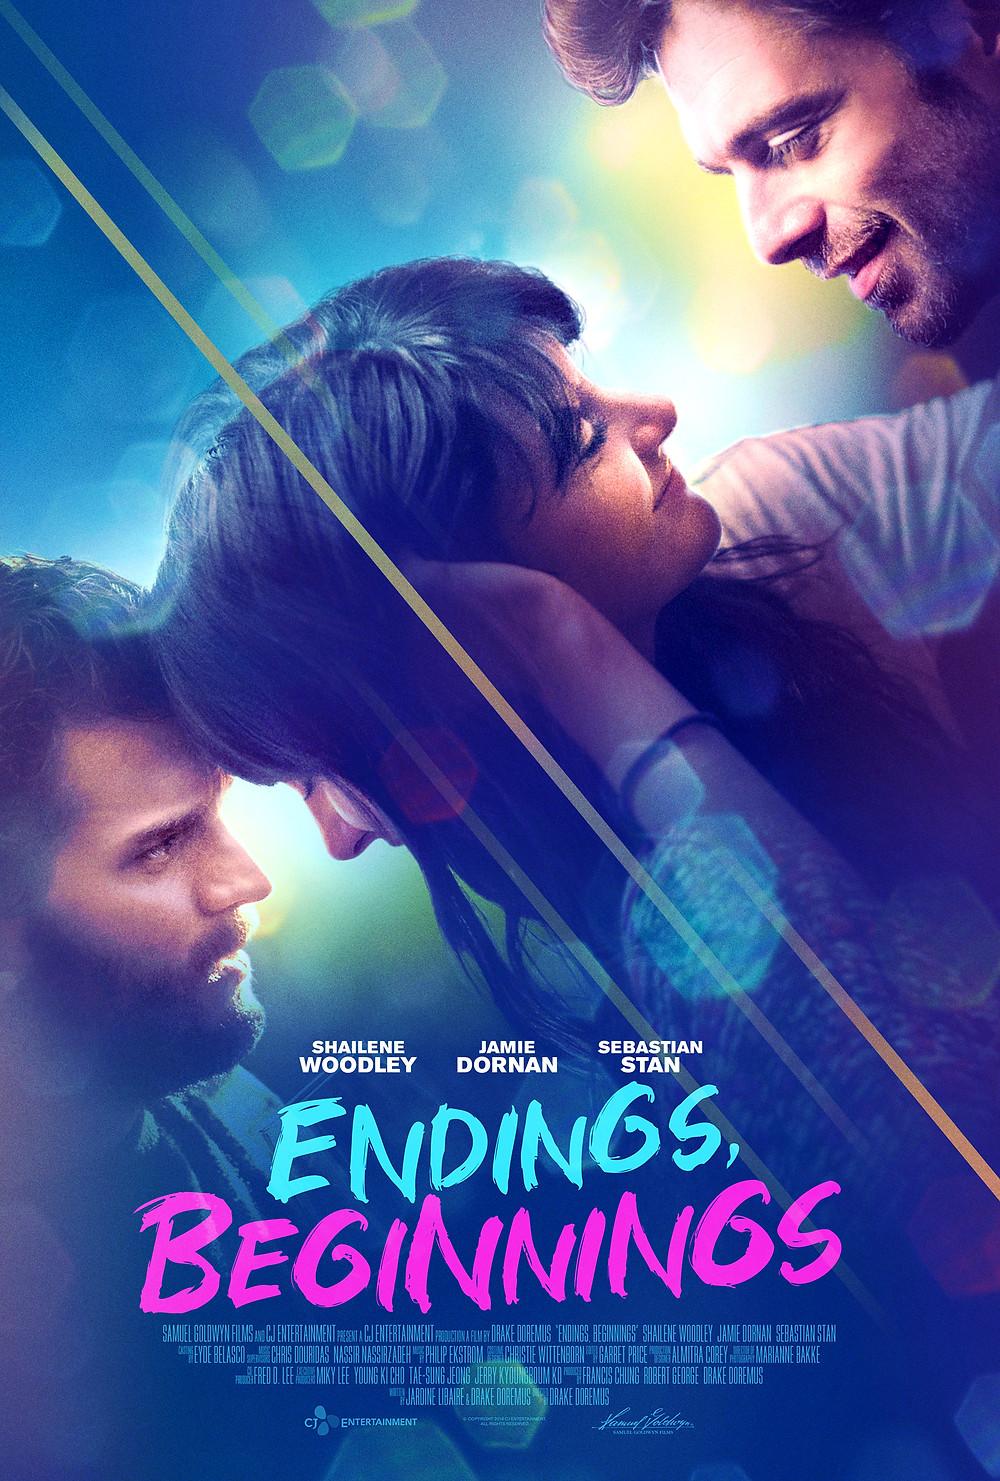 Endings, Beginnings movie poster starring Shailene Woodley, Jamie Dornan and Sebastian Stan. Photo from Samuel Goldwyn Films